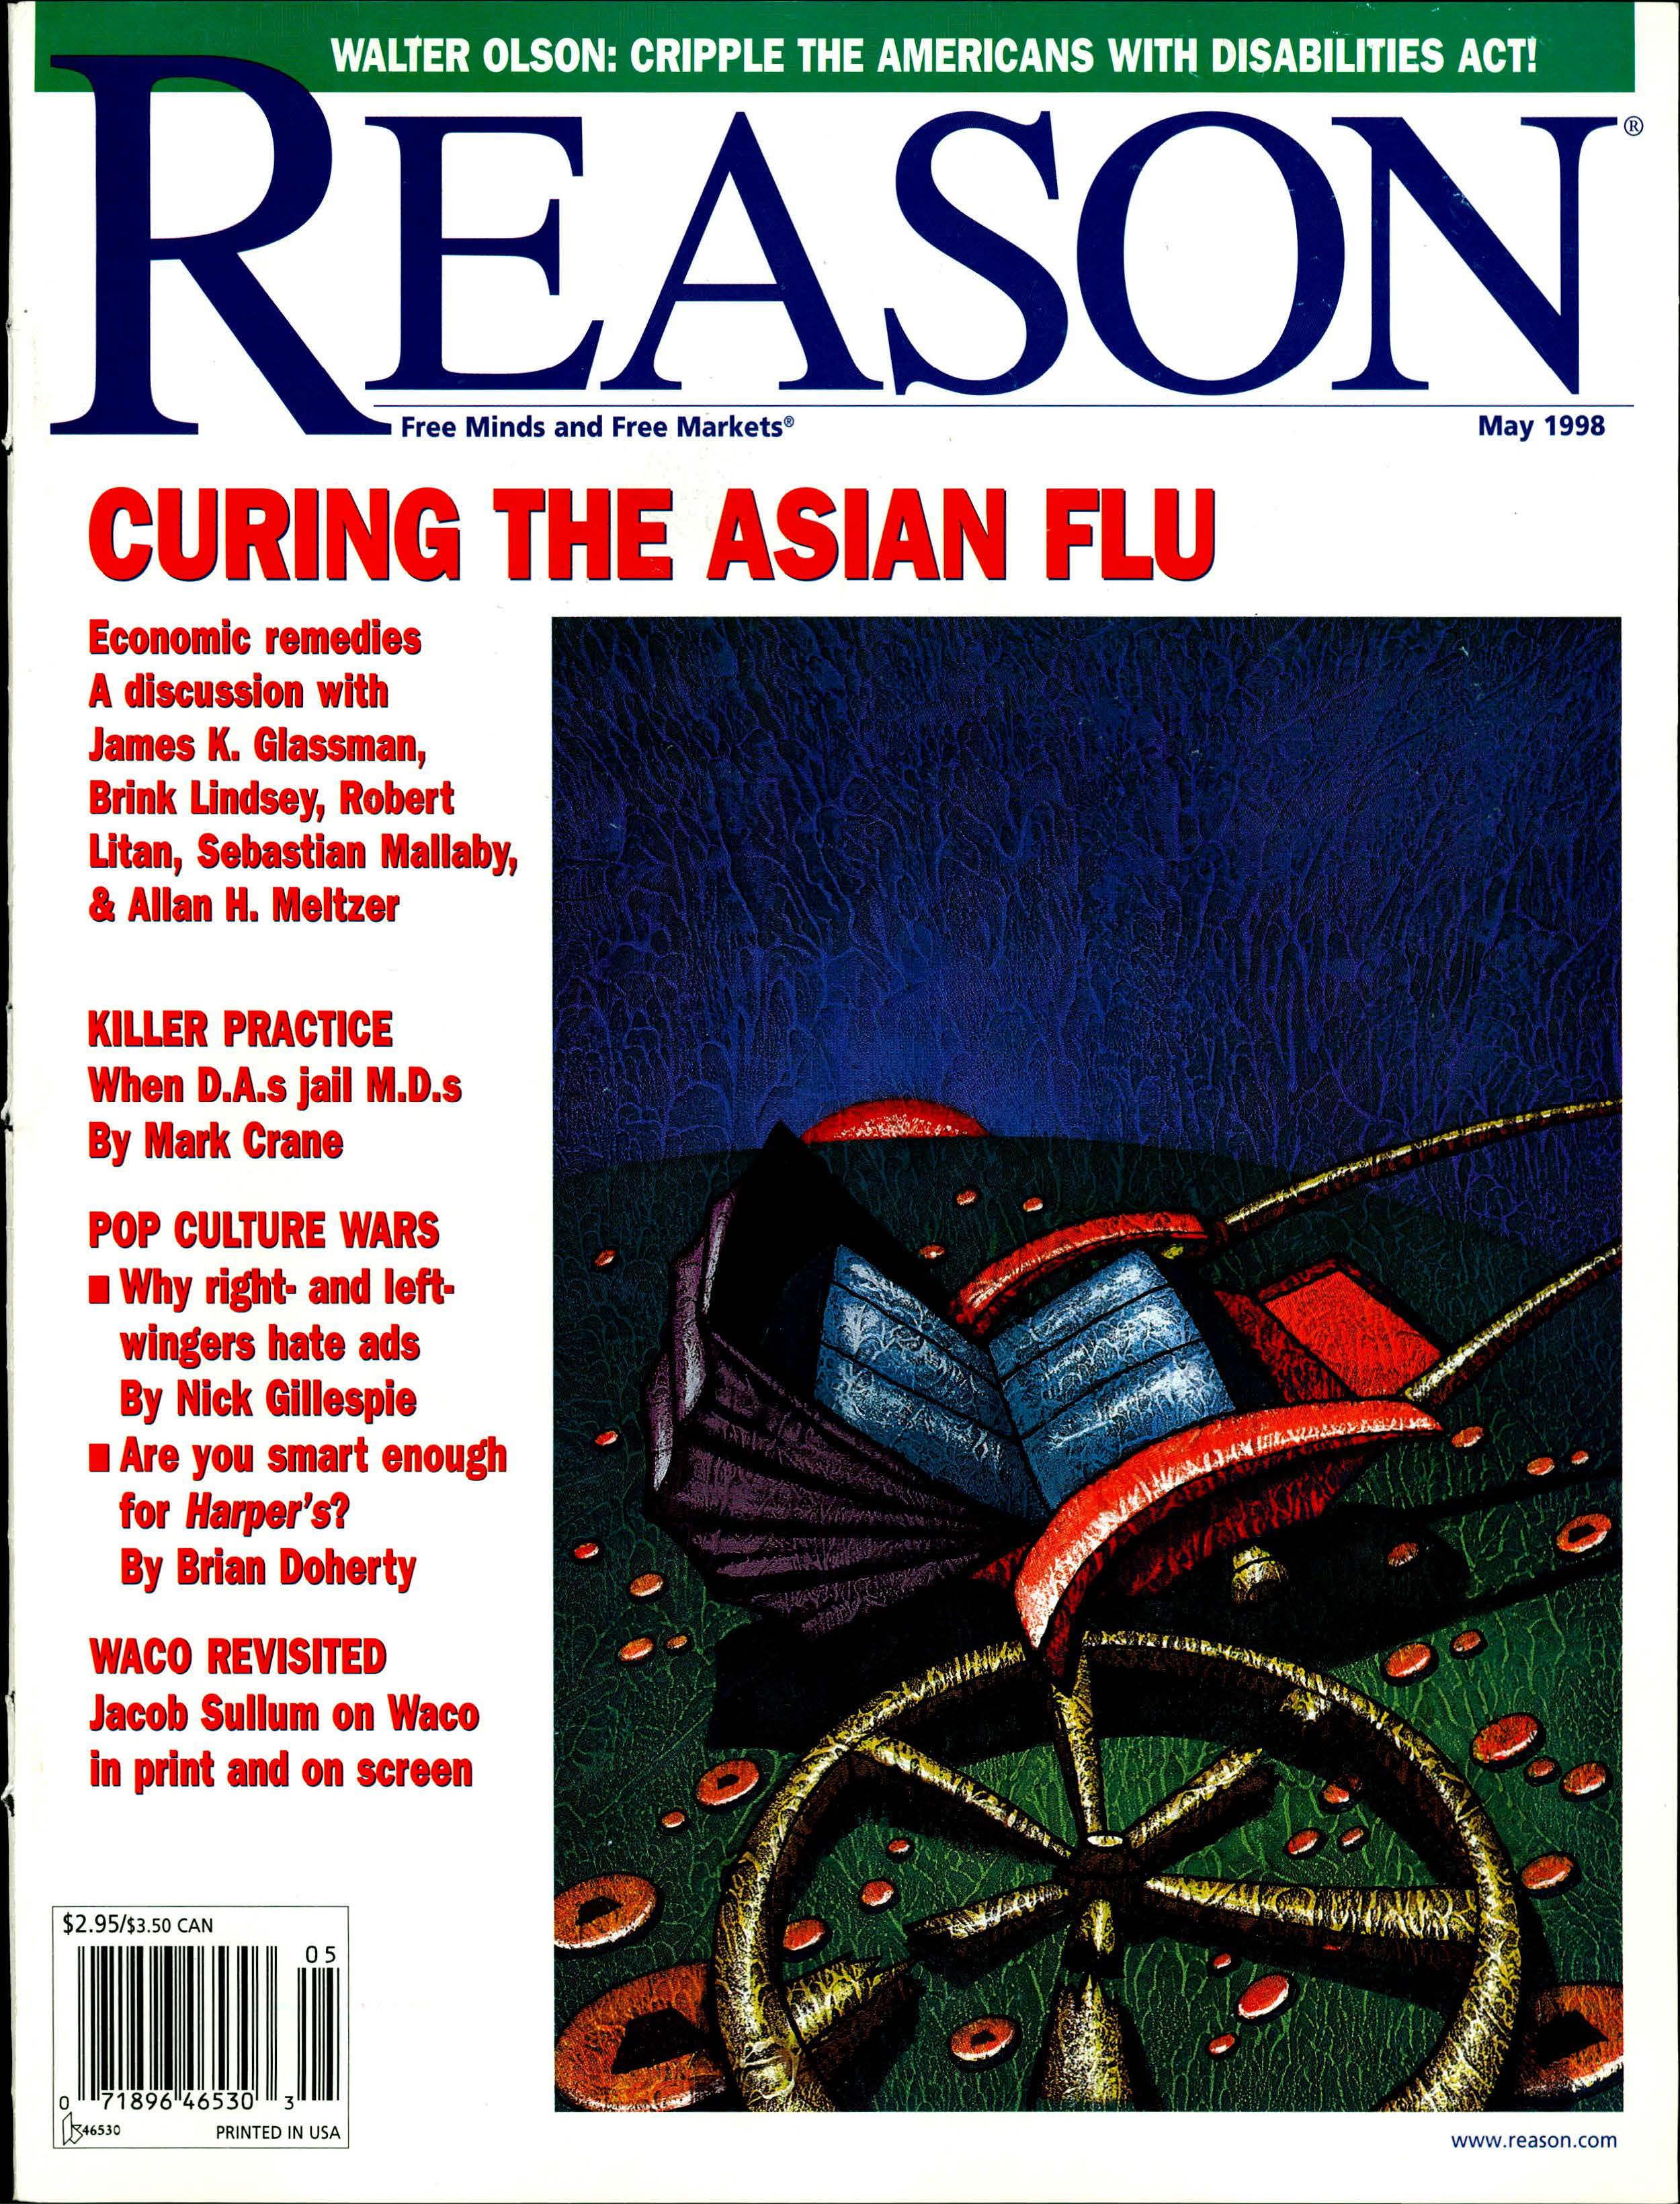 Reason Magazine, May 1998 cover image